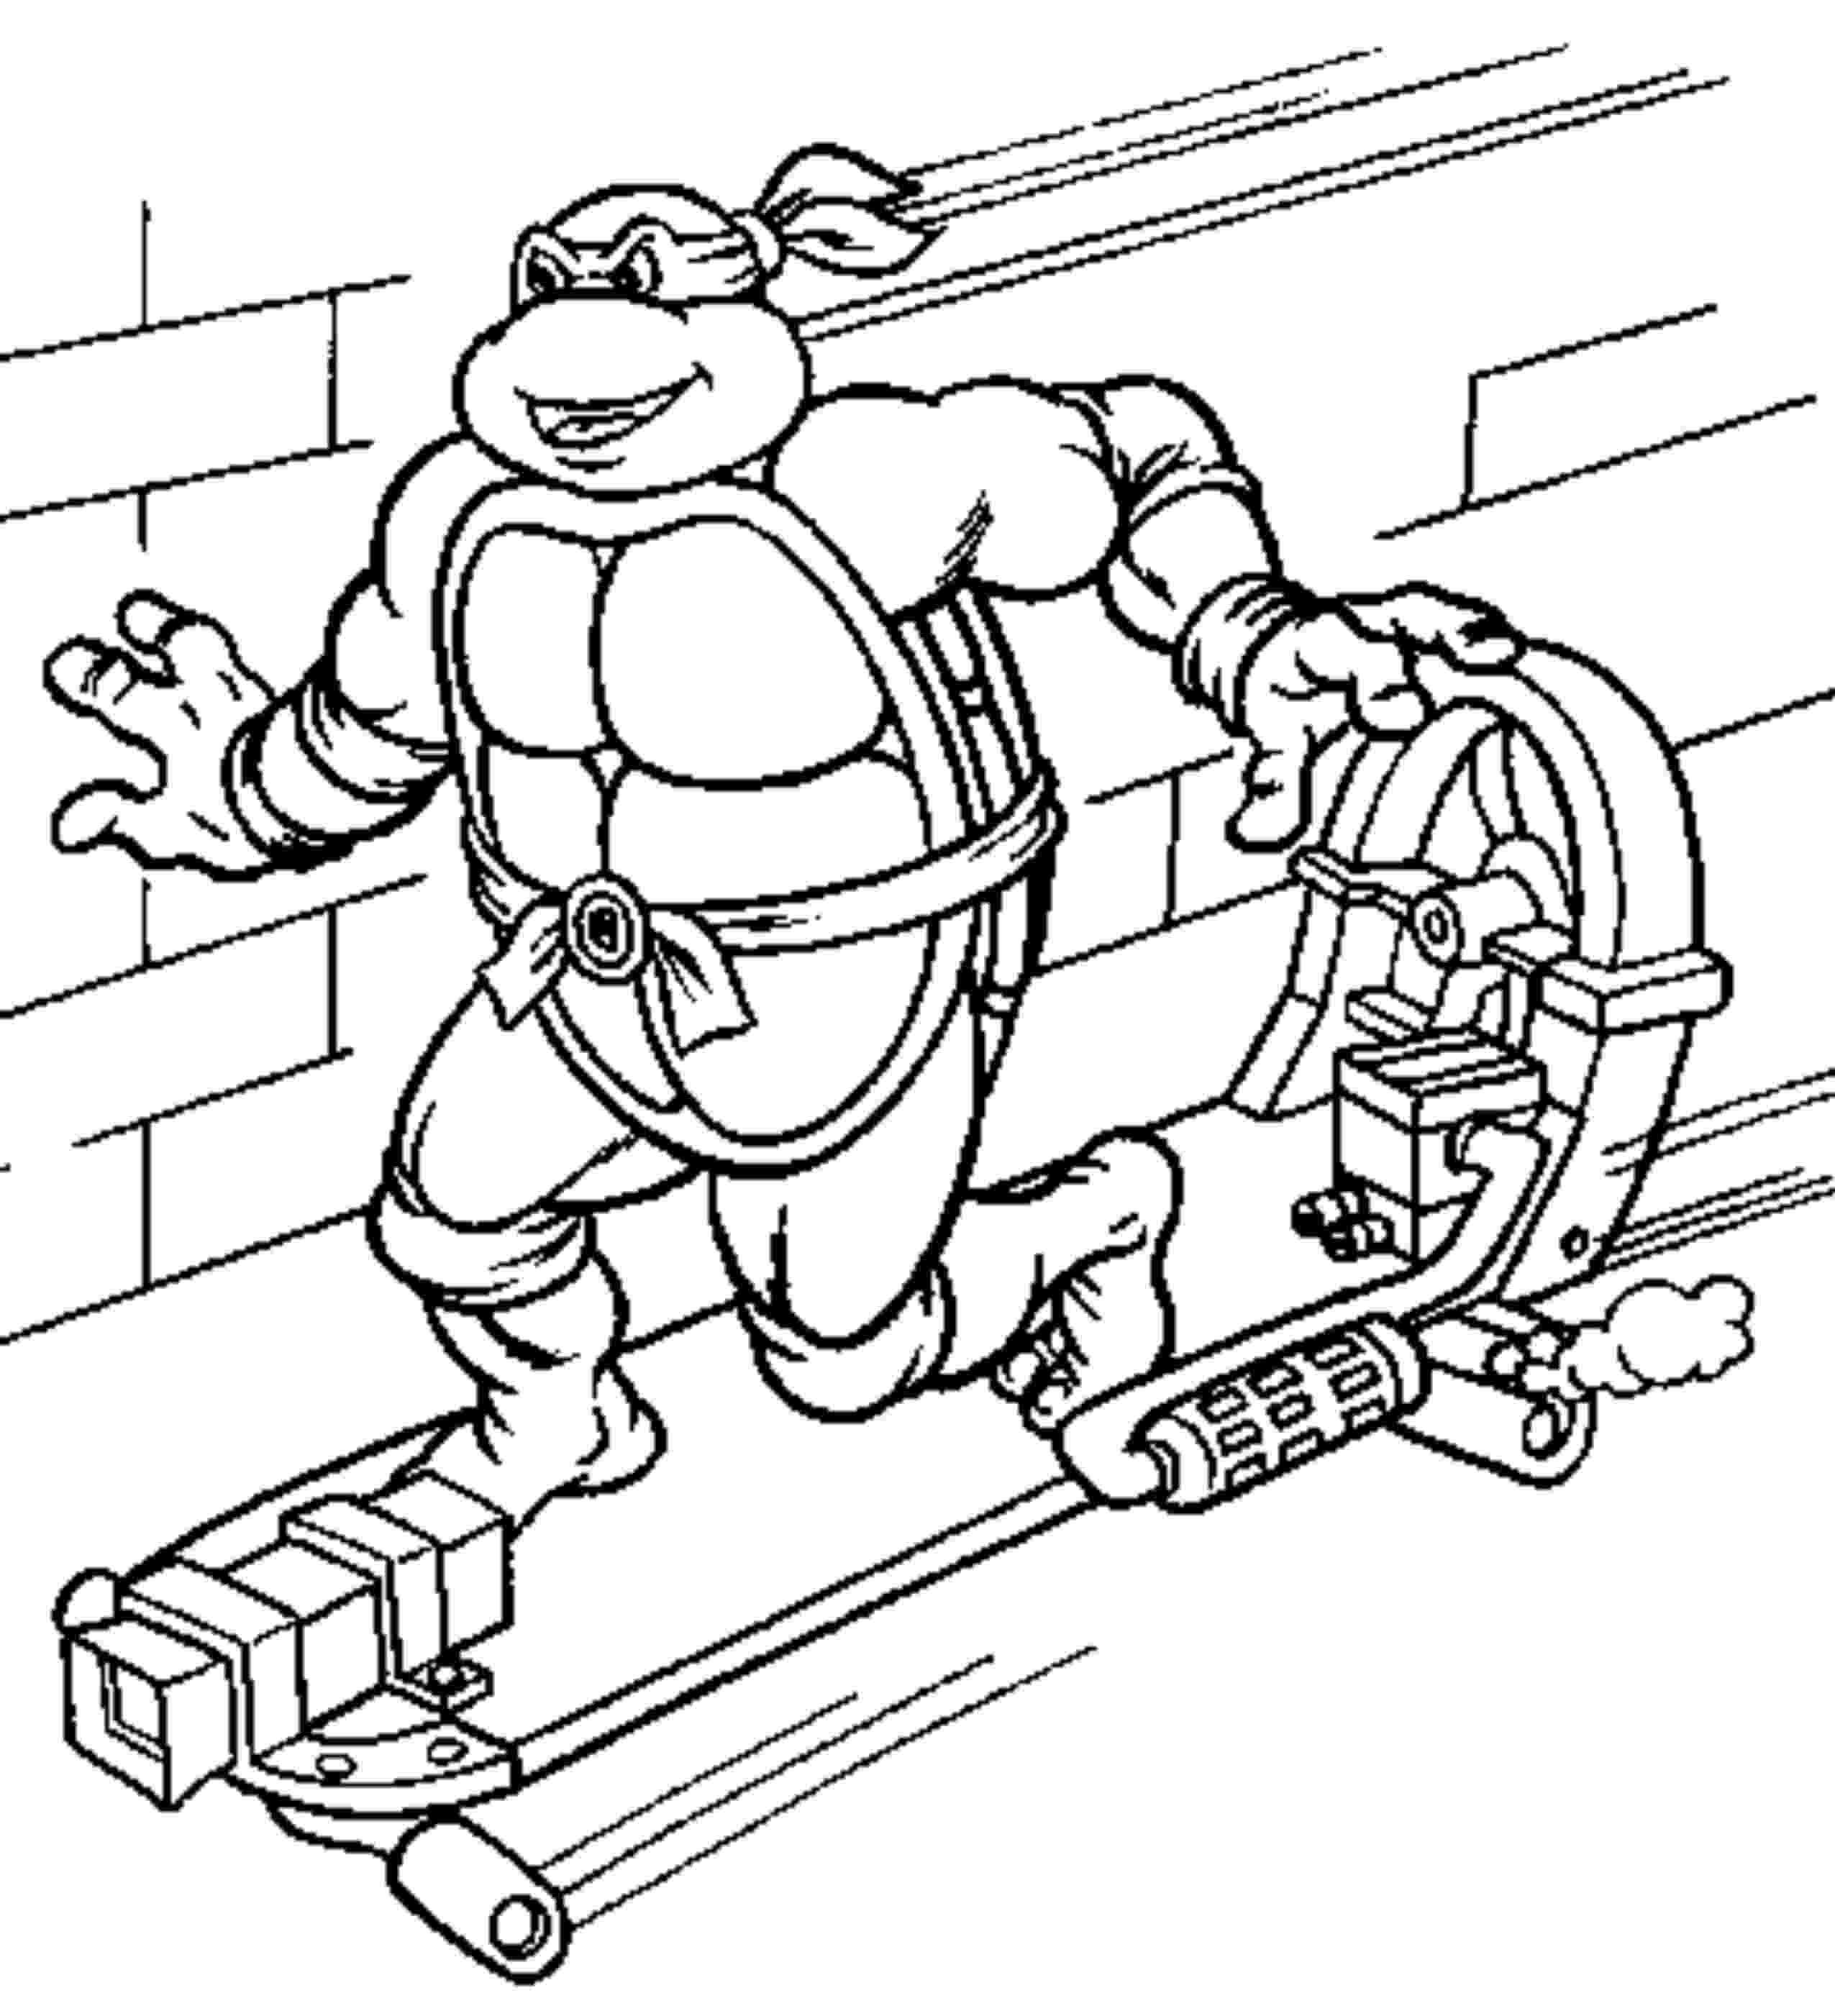 coloring pages turtles ninja free teenage mutant ninja turtles coloring pages for kids coloring turtles ninja pages